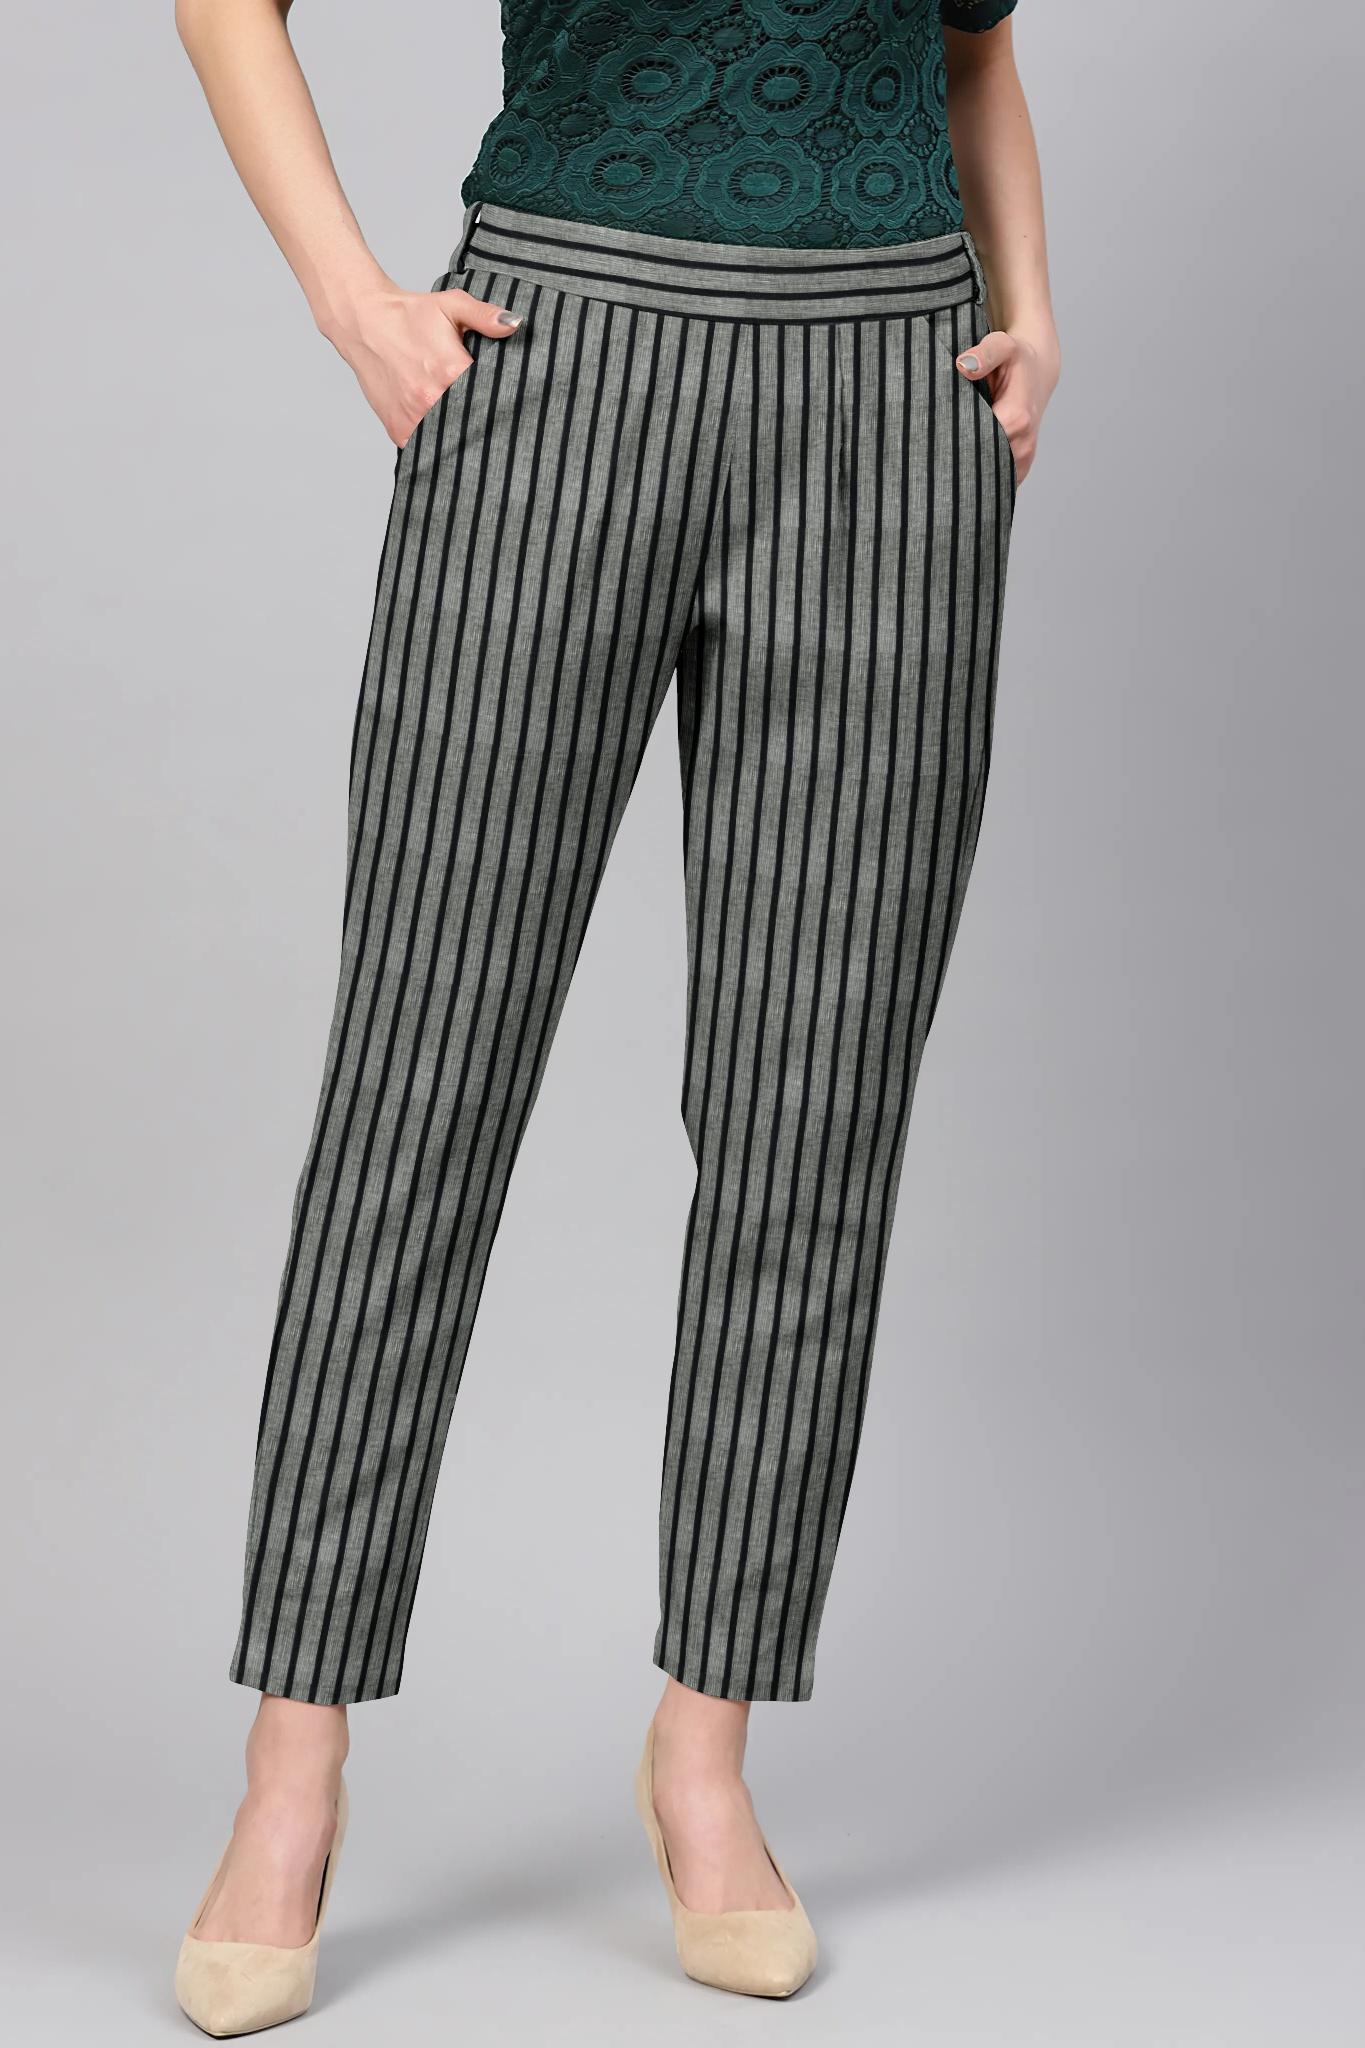 /home/customer/www/fabartcraft.com/public_html/uploadshttps://www.shopolics.com/uploads/images/medium/Gray-Black-Cotton-Stripe-Regular-Fit-Solid-Trouser-36051.jpg